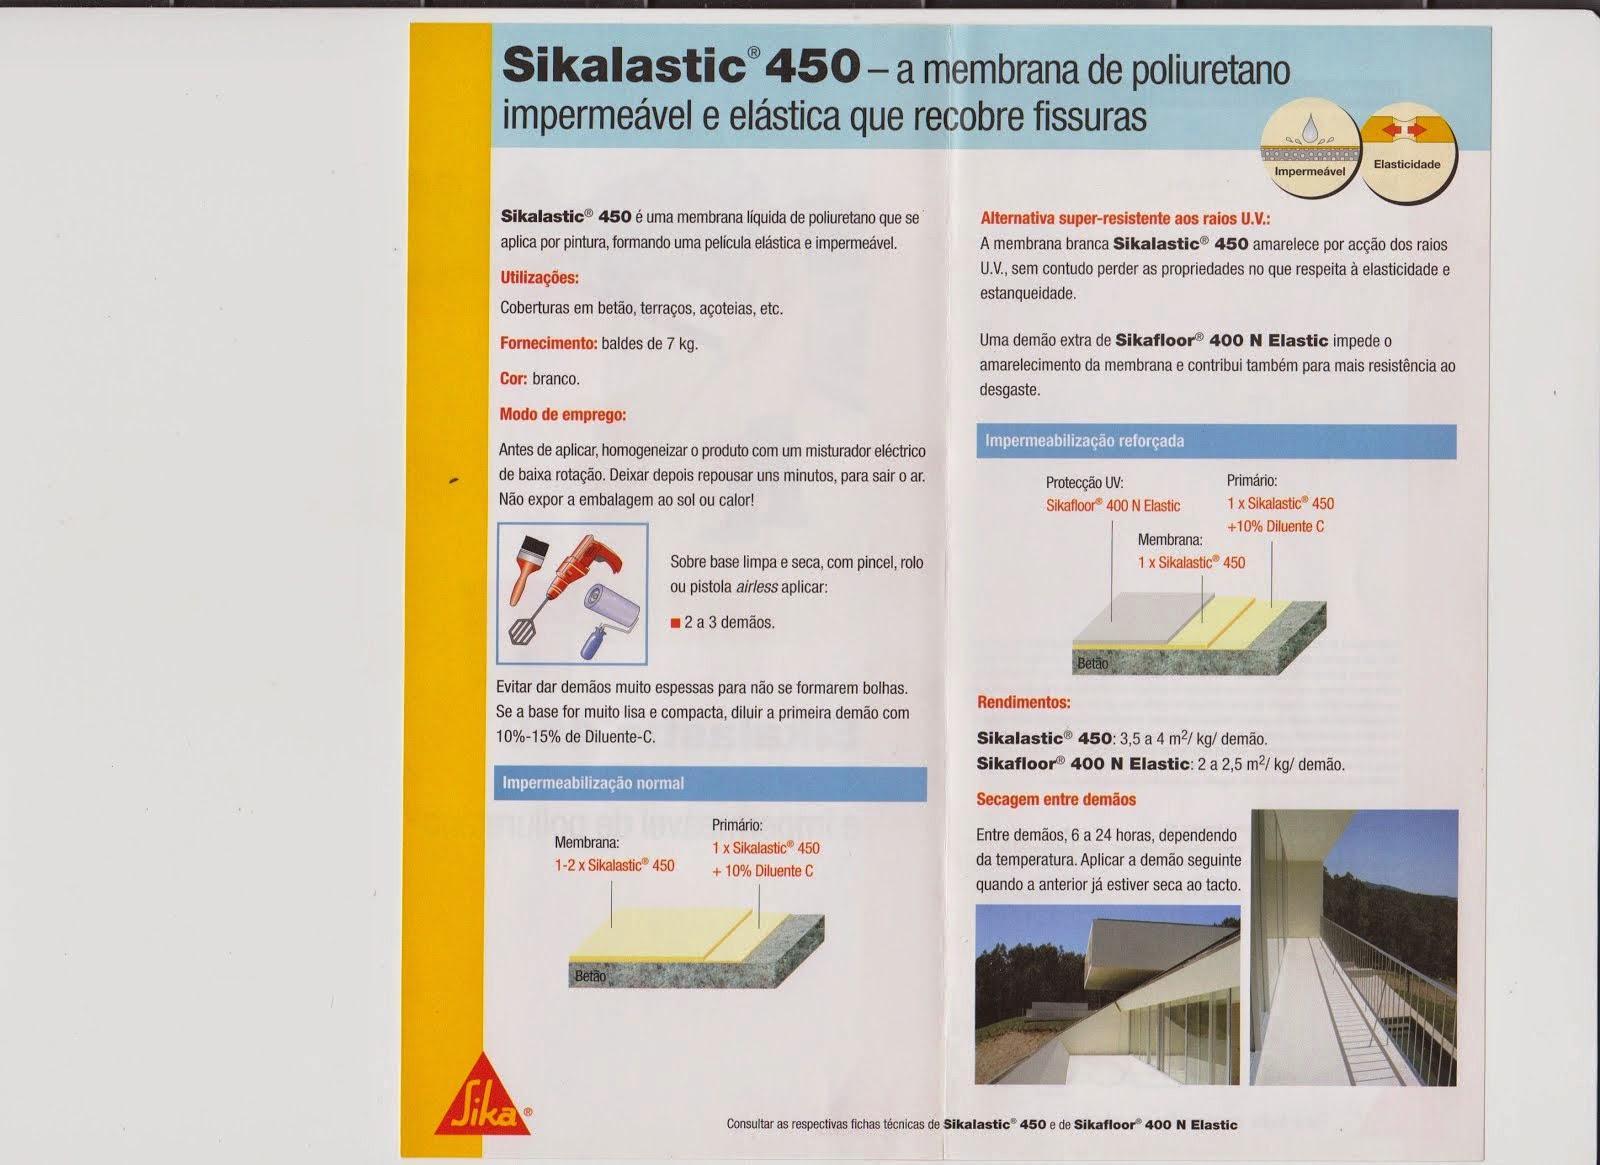 Sikalastic 450